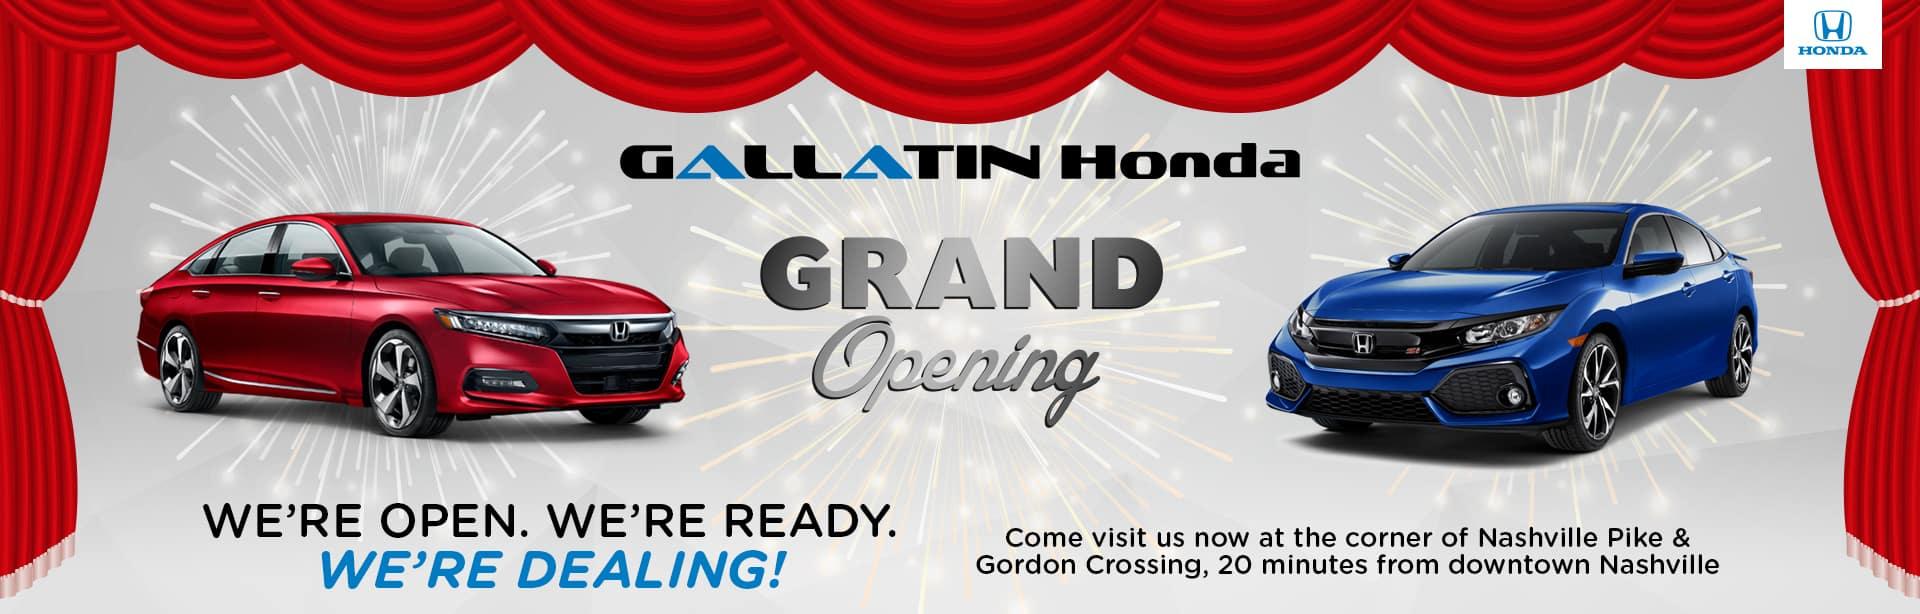 Owners Honda Com >> Gallatin Honda New Honda Dealership Serving Nashville Tn